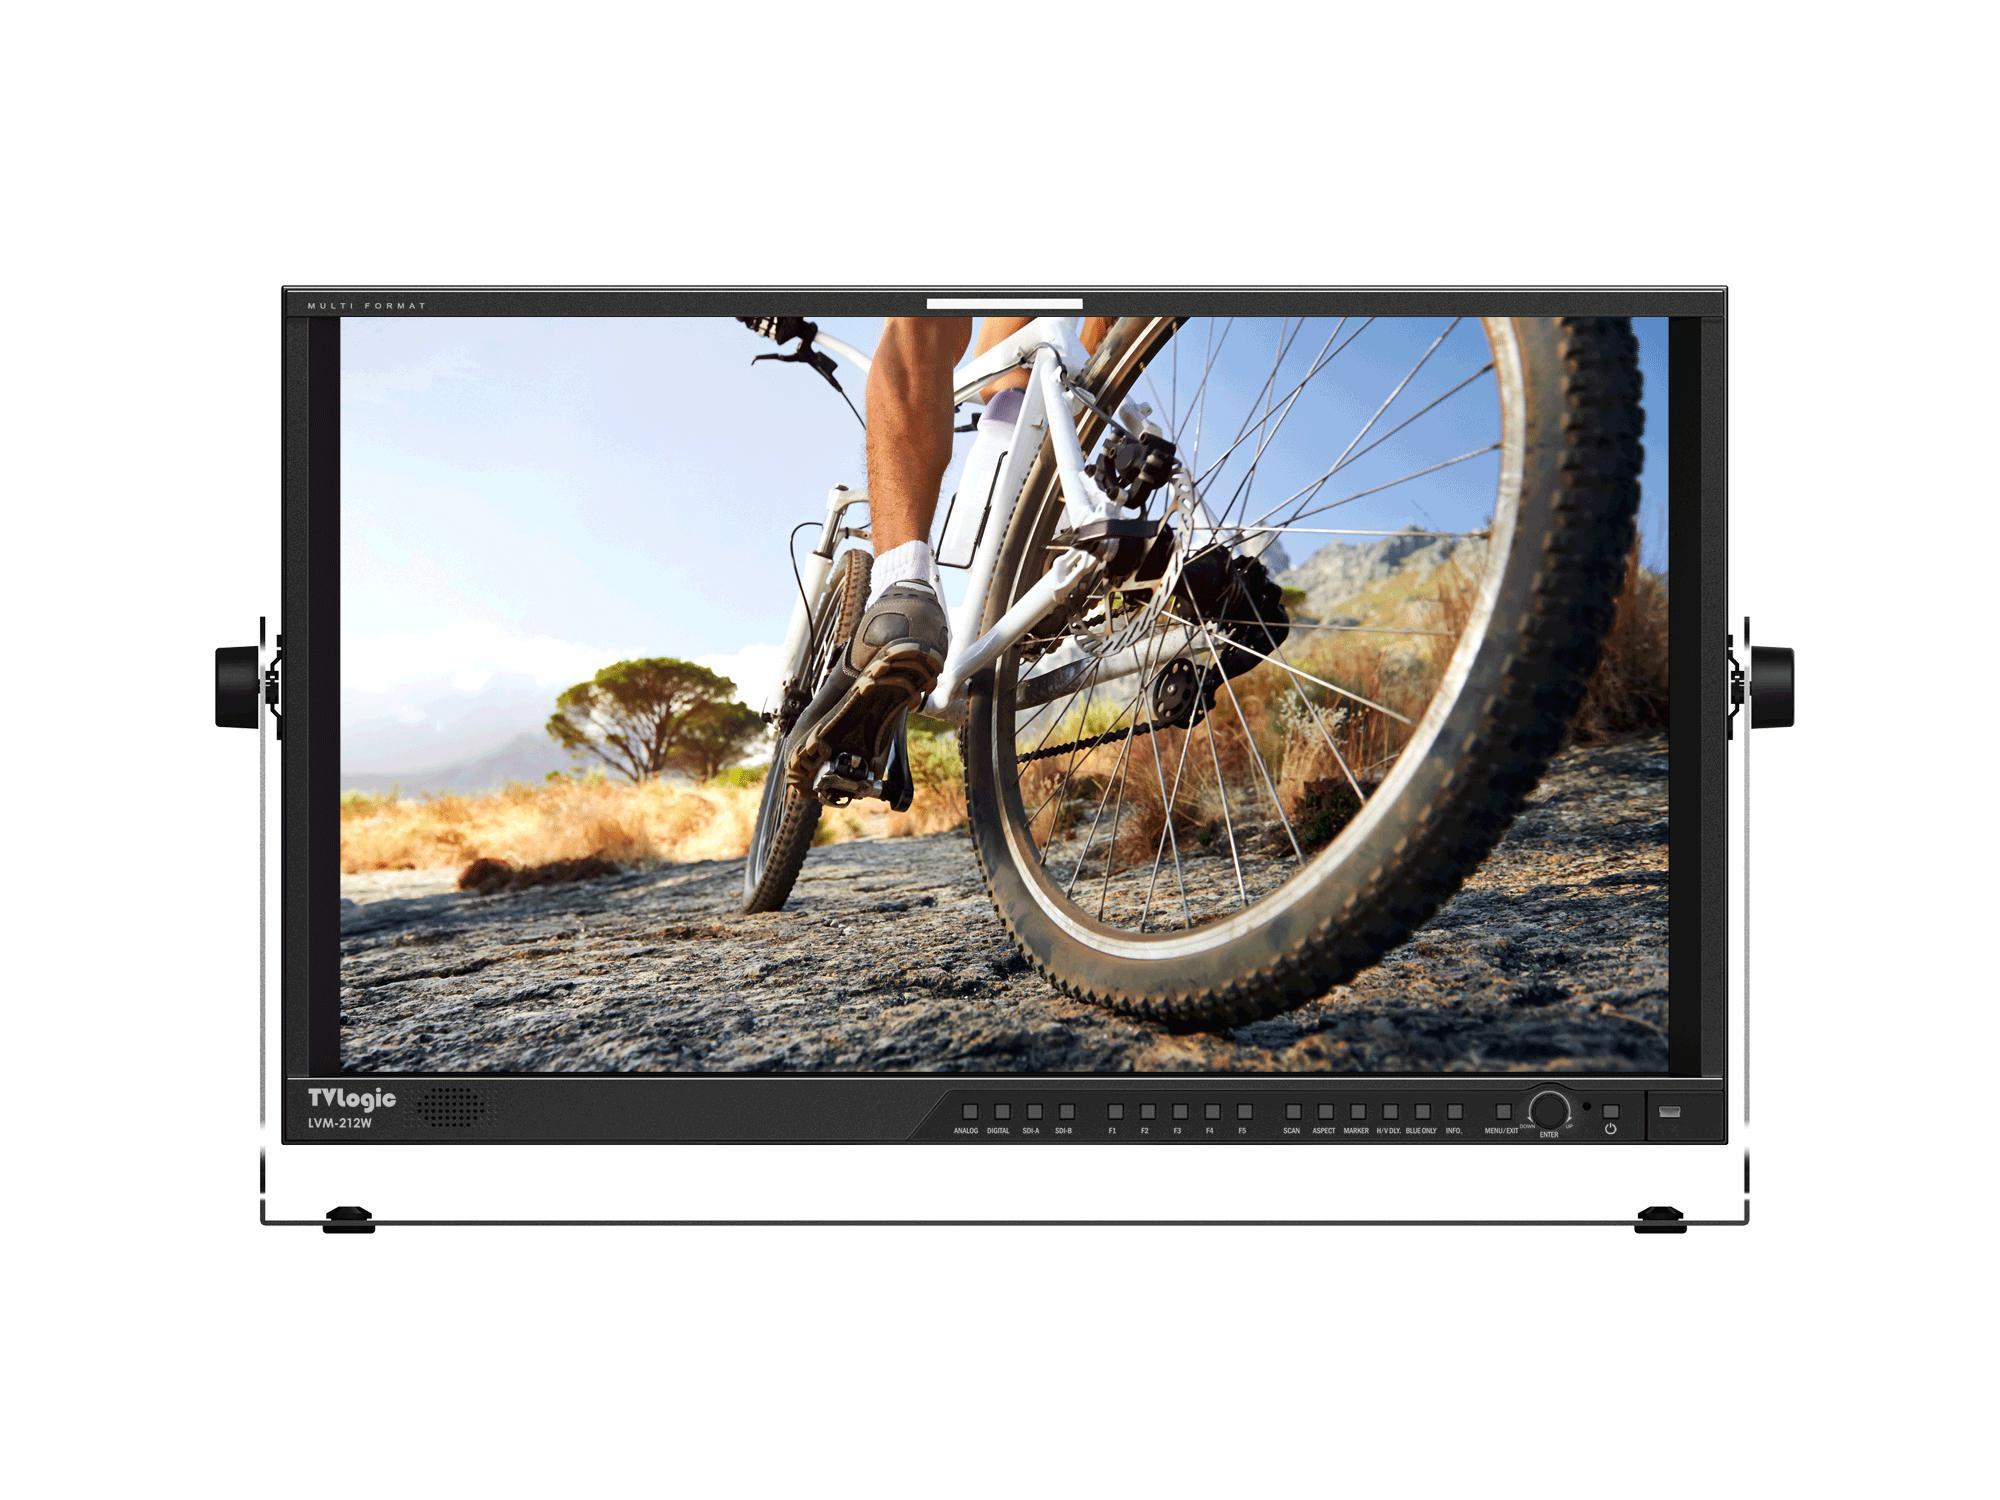 TVlogic LVM-212W 21.5 inch Component/3G-SDI/DVI/HDMI Full HD 1920x1200 LCD Monitor